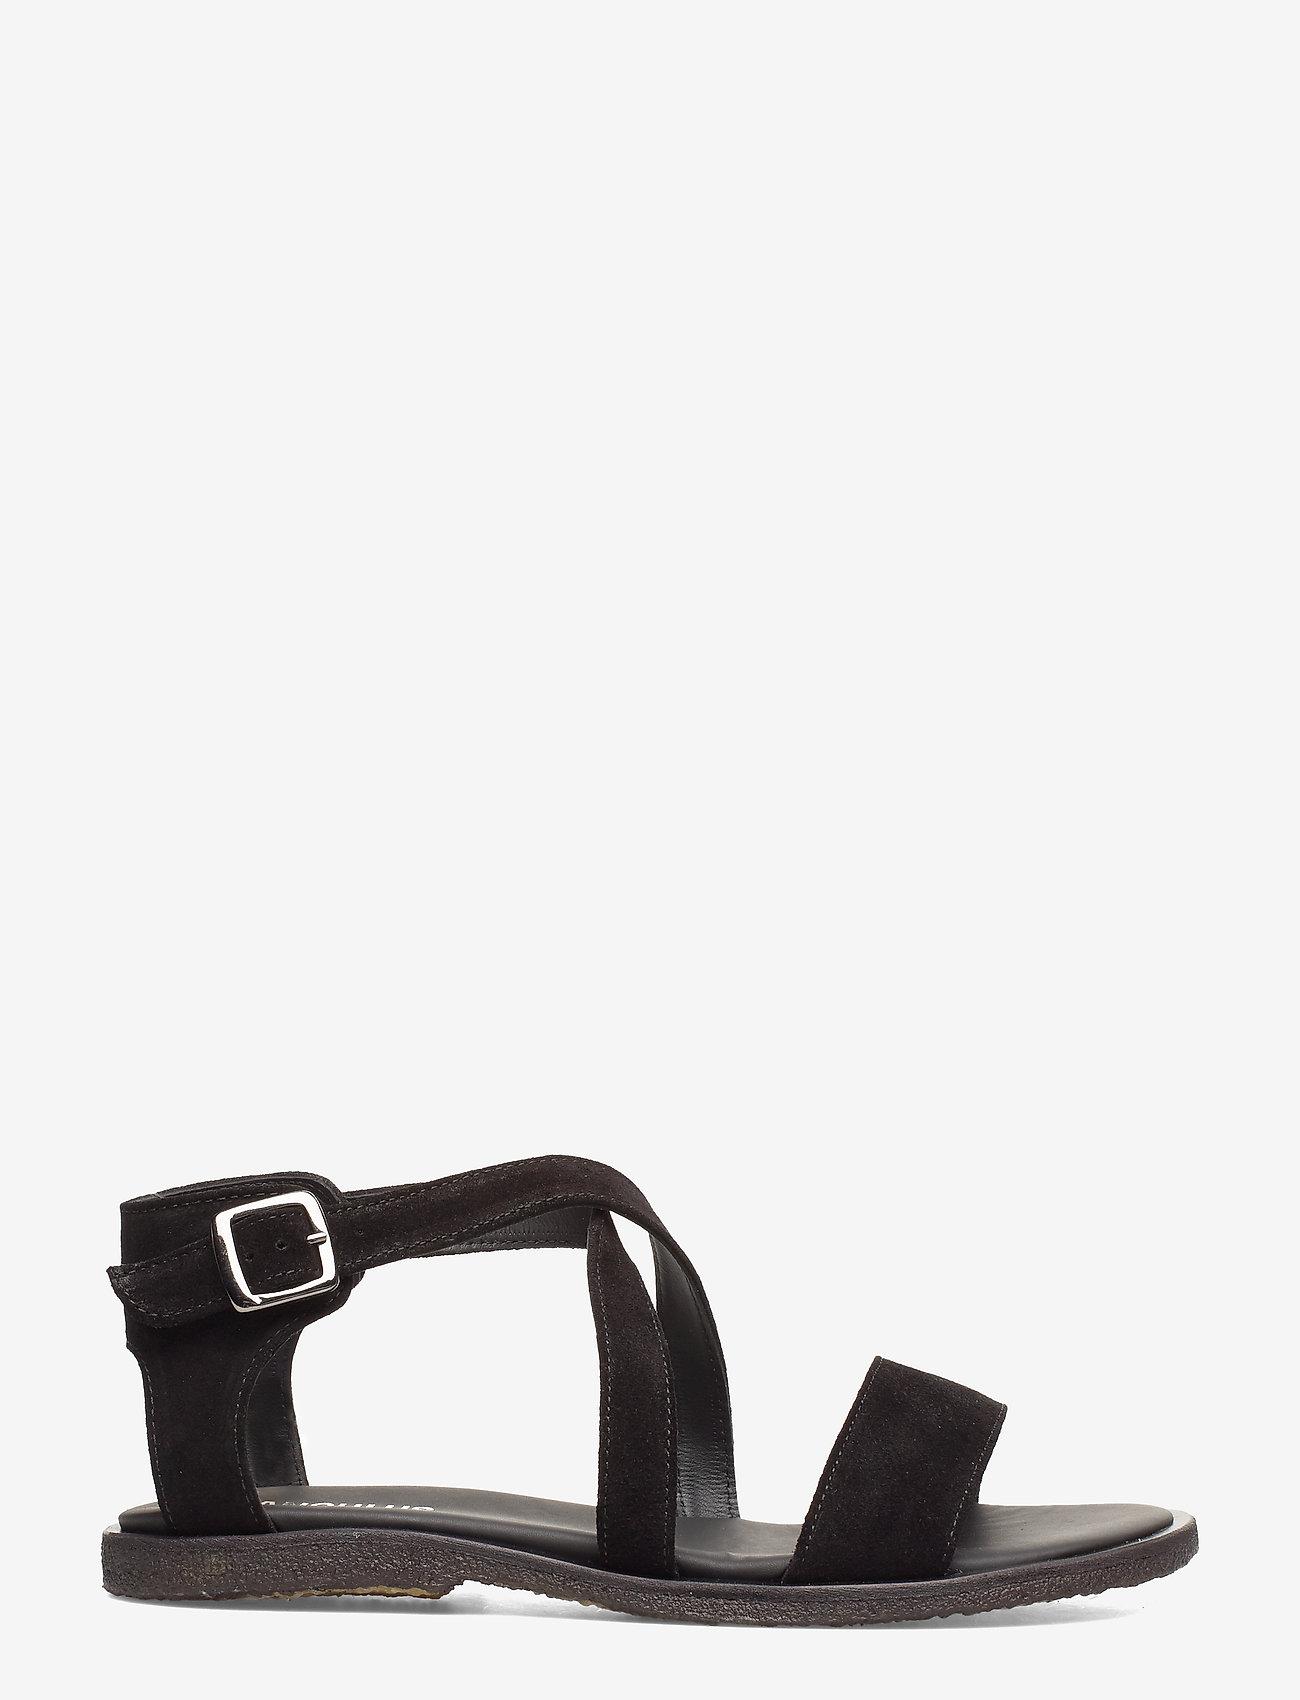 ANGULUS - 5442 - flache sandalen - 1163 black - 1